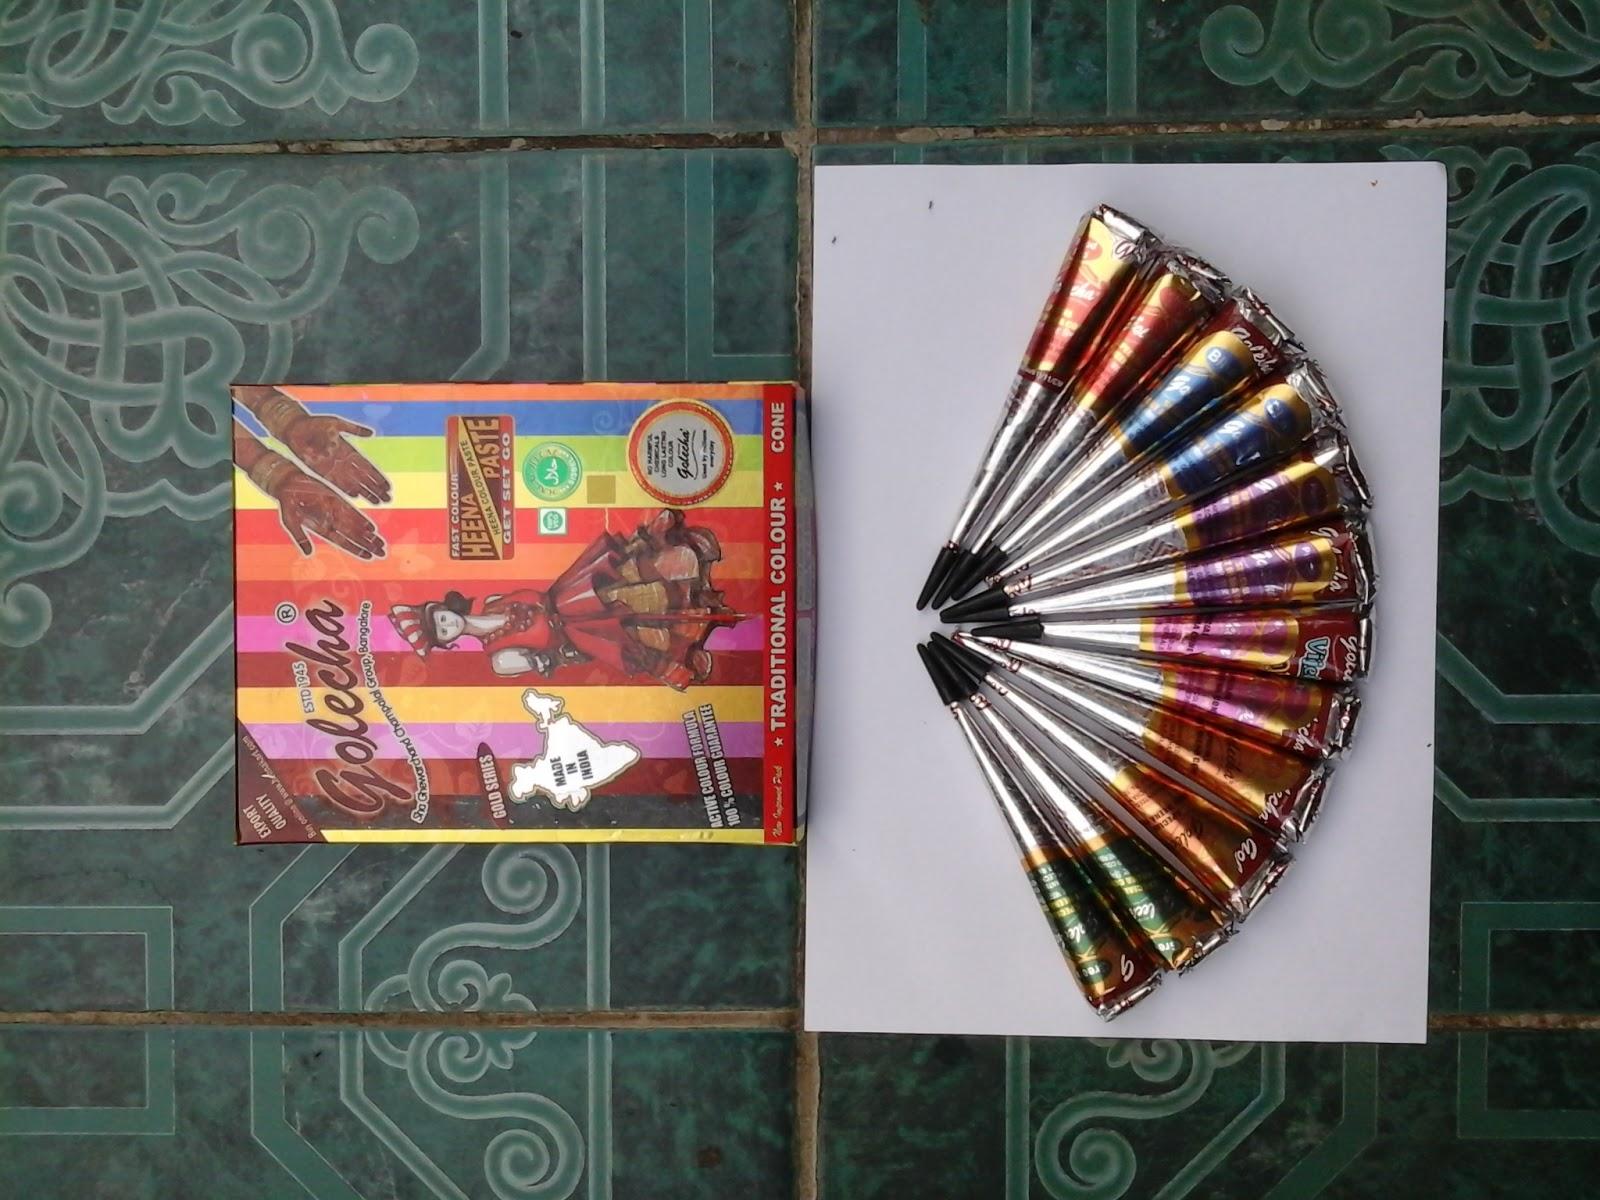 Henna Party Mehndi Kerucut Merah : Henna golecha indonesia color cone